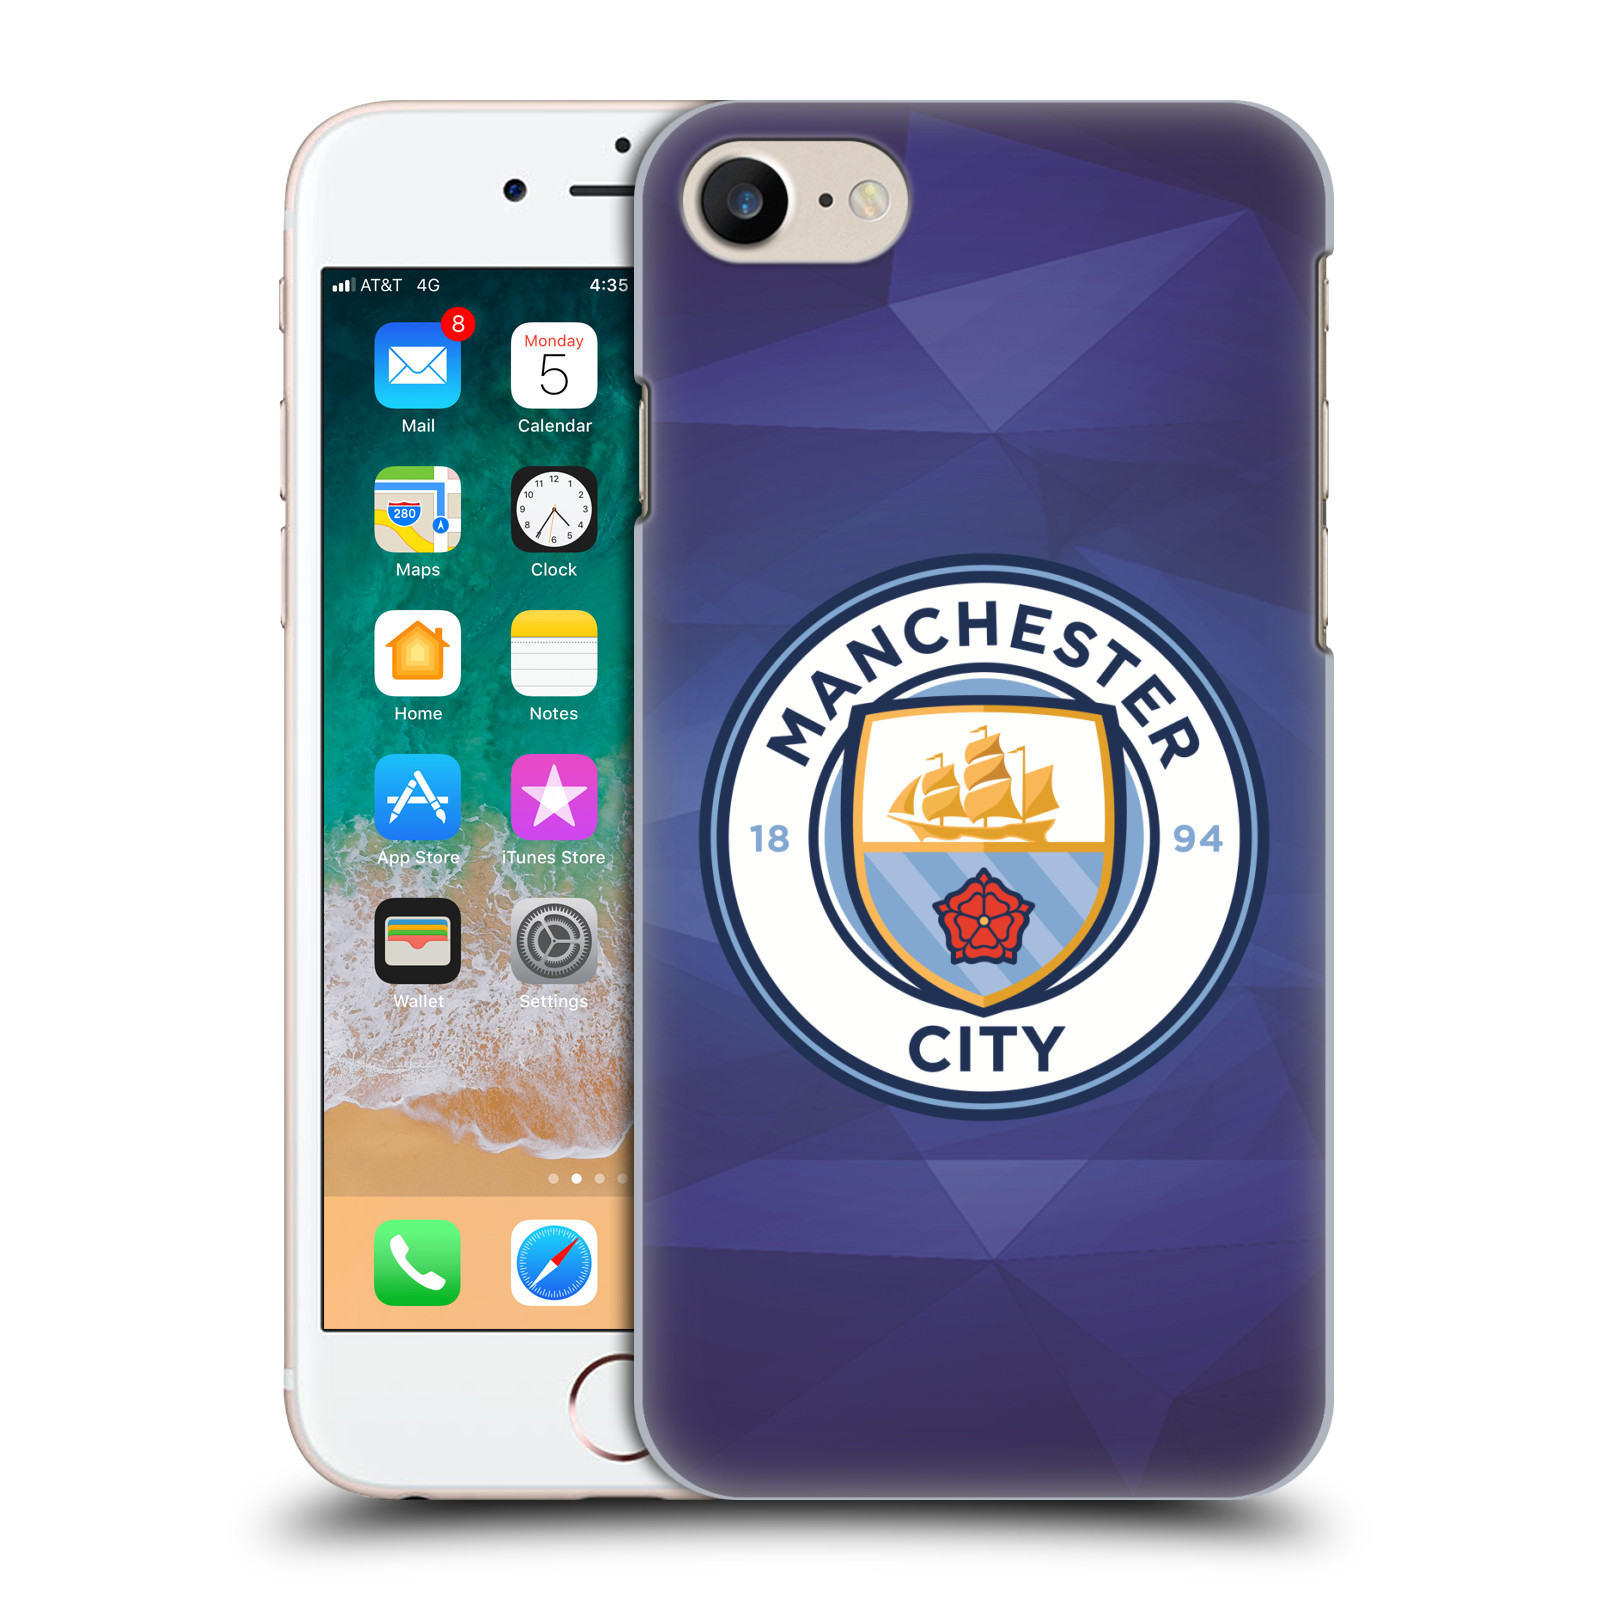 Plastové pouzdro na mobil Apple iPhone SE (2020) - Head Case - Manchester City FC - Modré nové logo